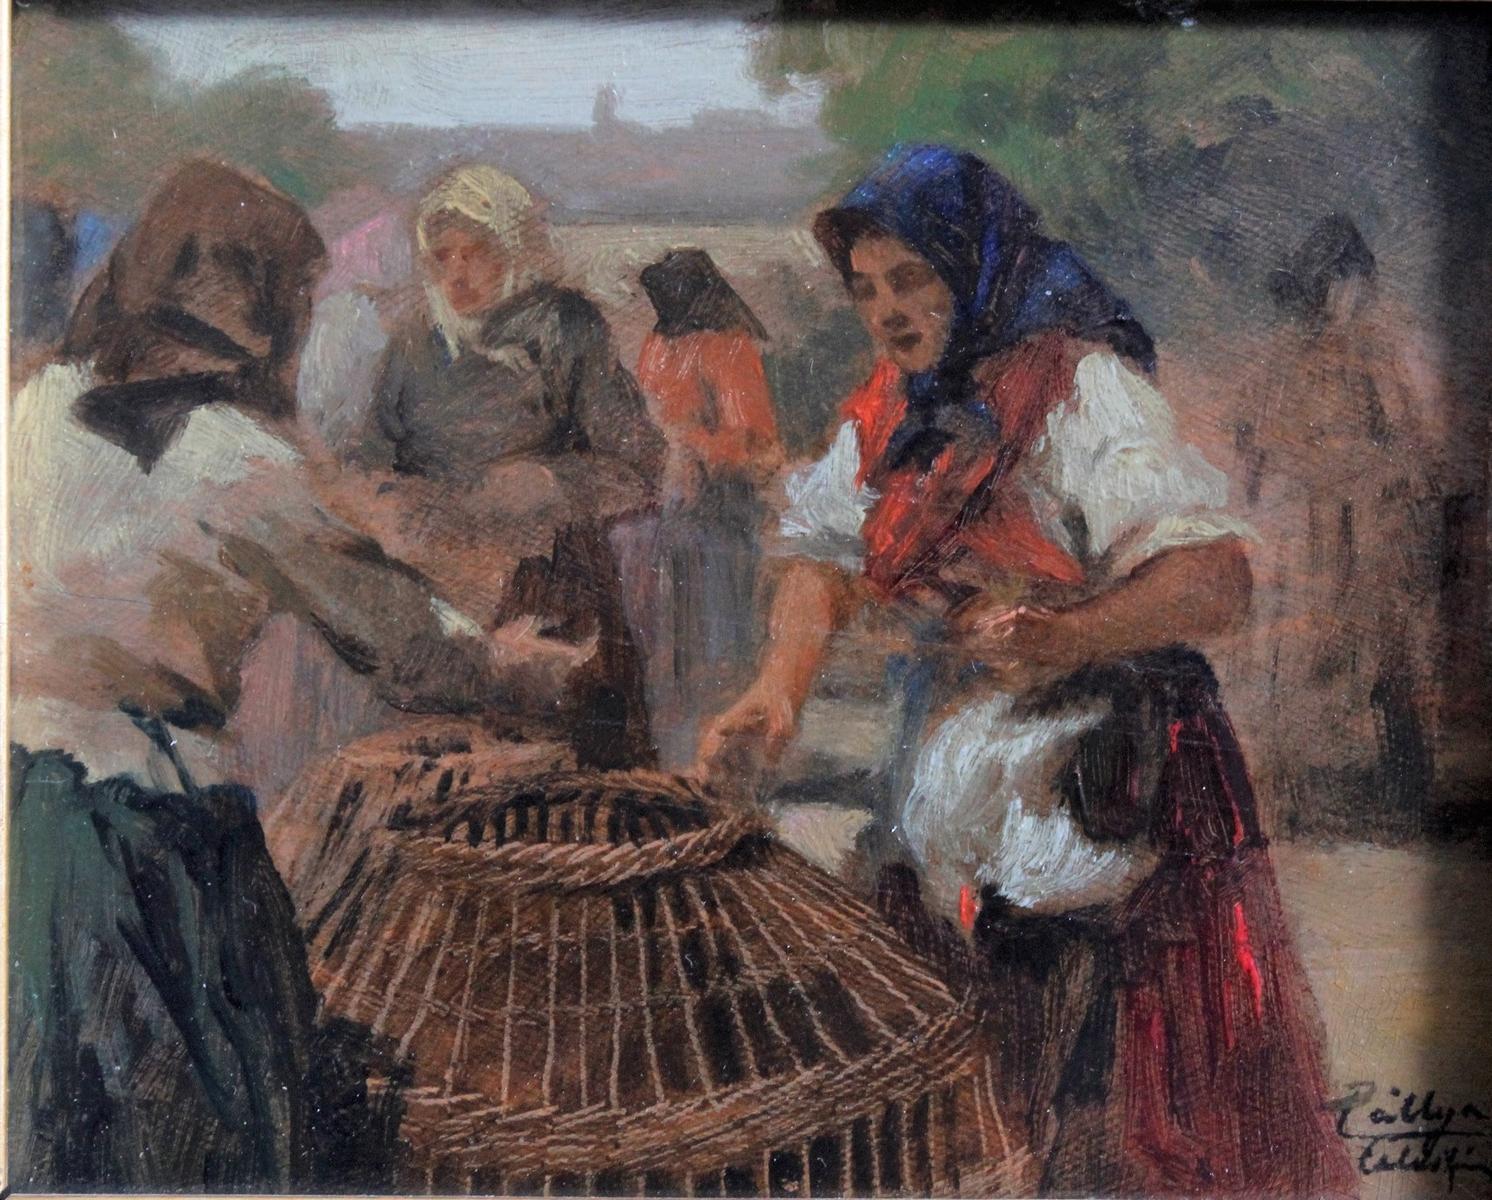 Celesztin PALLYA (1864-1948), Marktfrauen-2